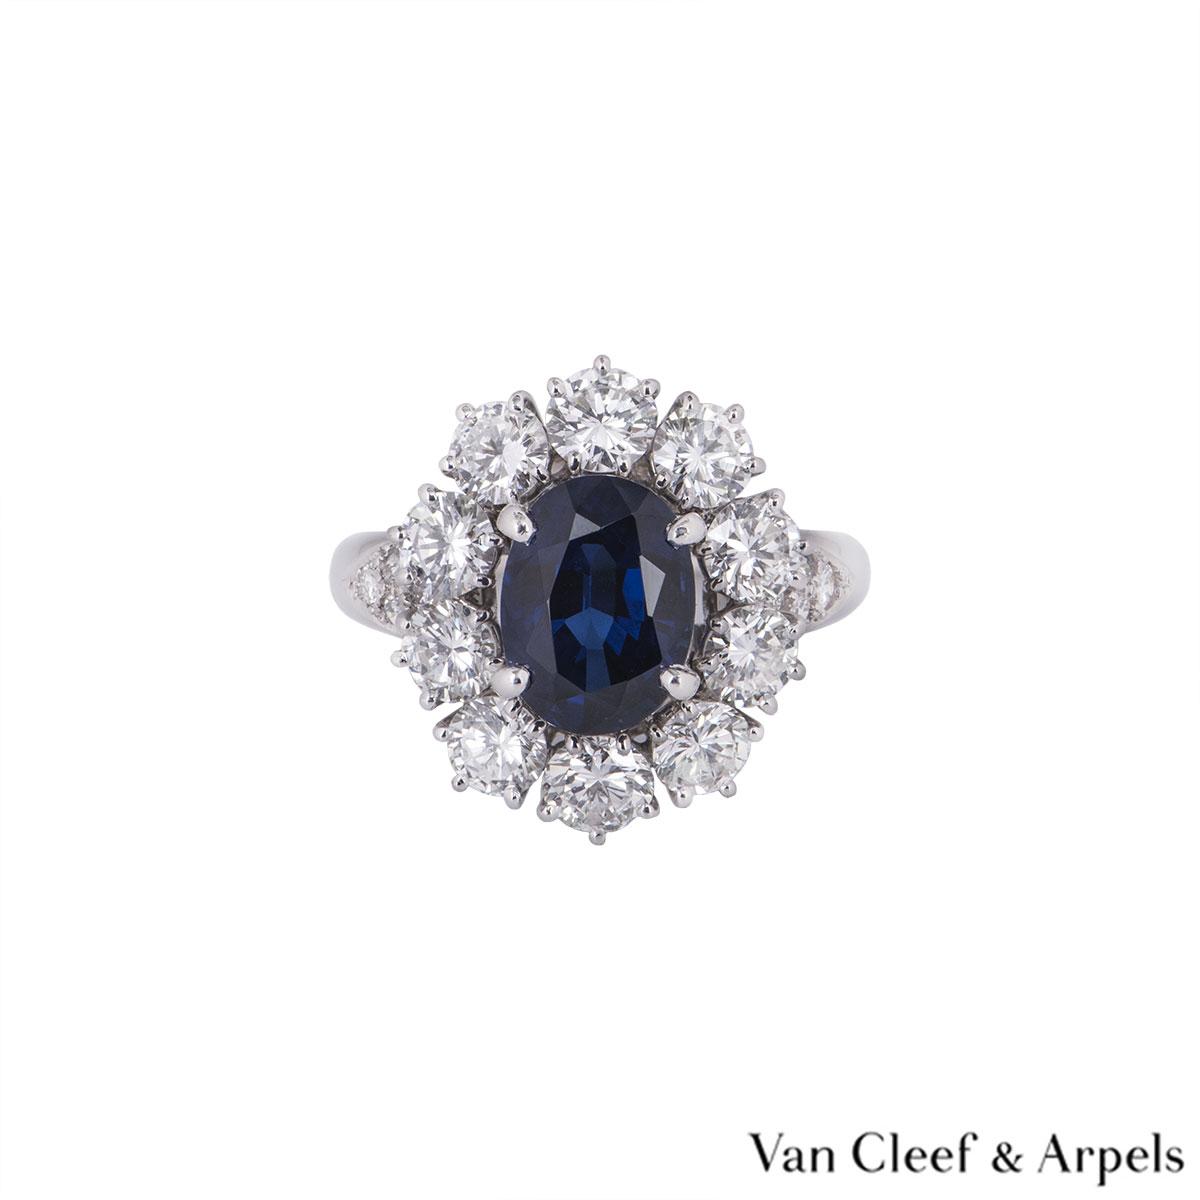 Van Cleef & Arpels Sapphire and Diamond Ring